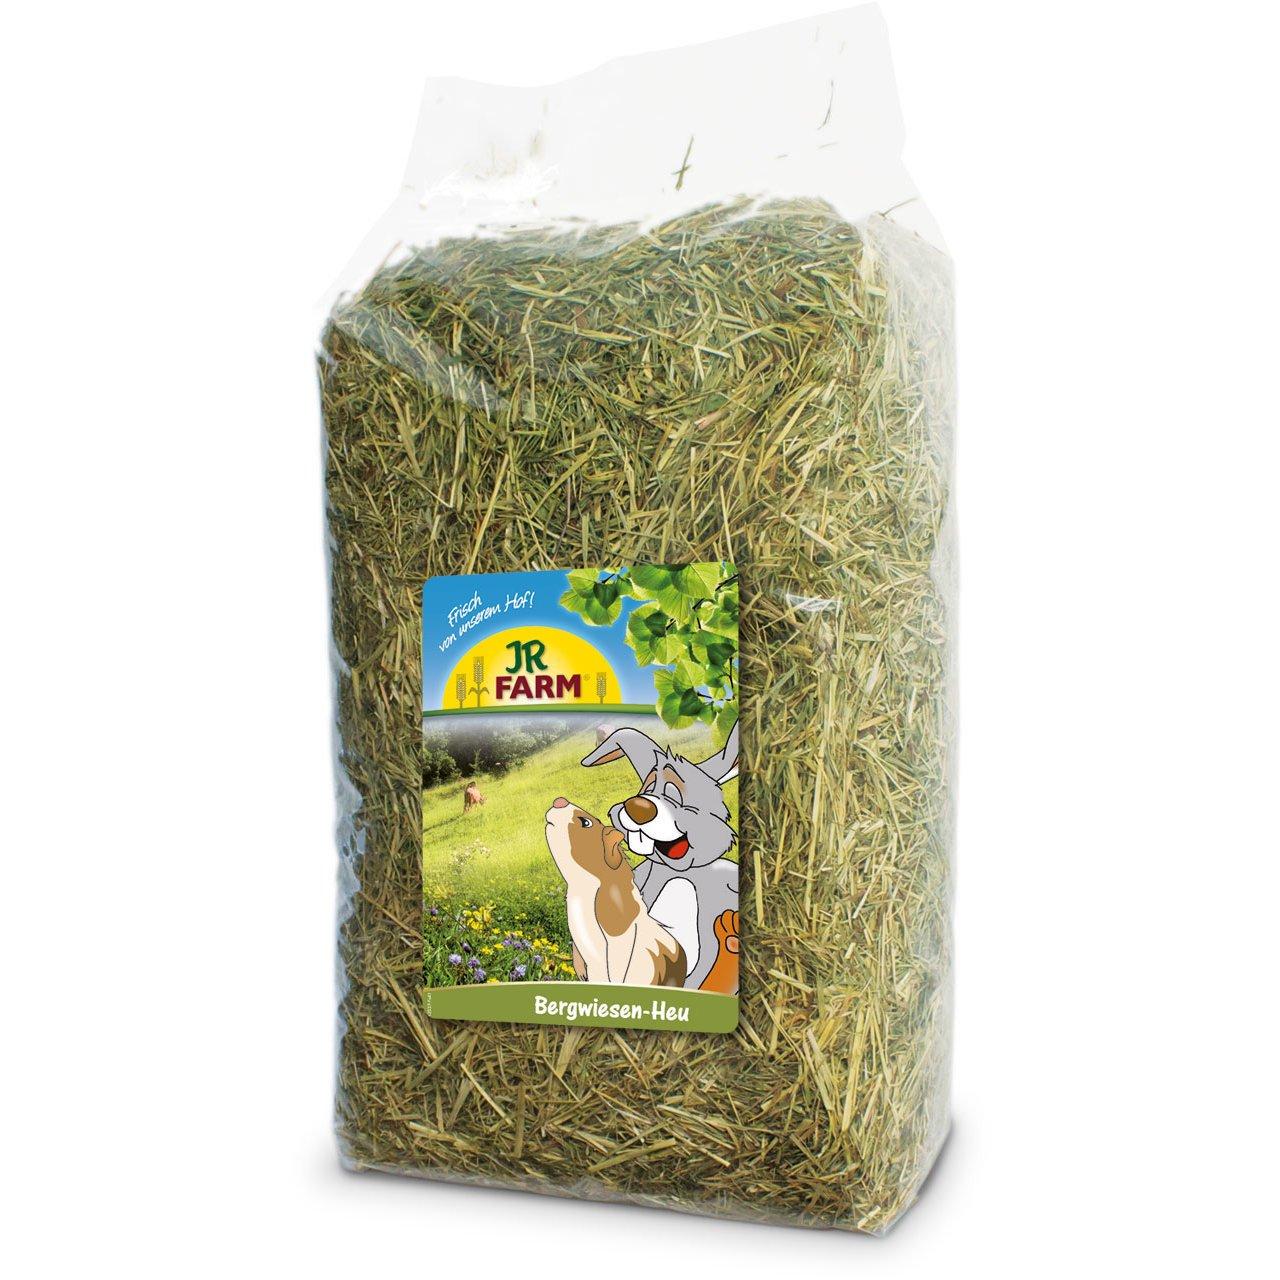 JR Farm Bergwiesen Heu, 1,5 kg